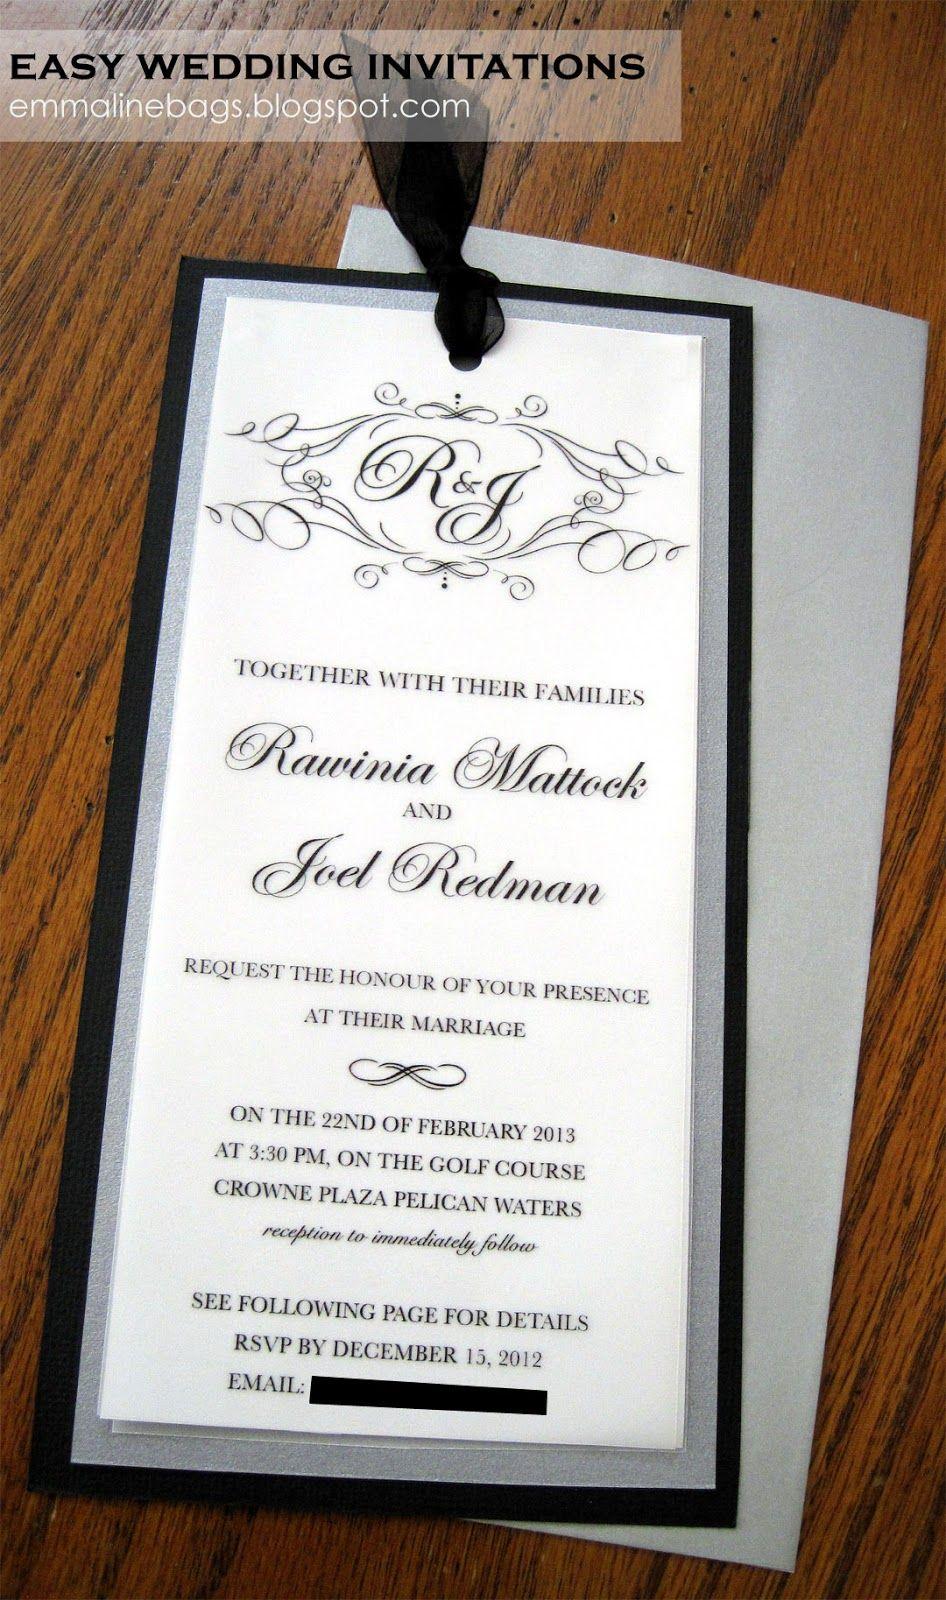 Emmaline Bags: Sewing Patterns and Purse Supplies: DIY Wedding ...